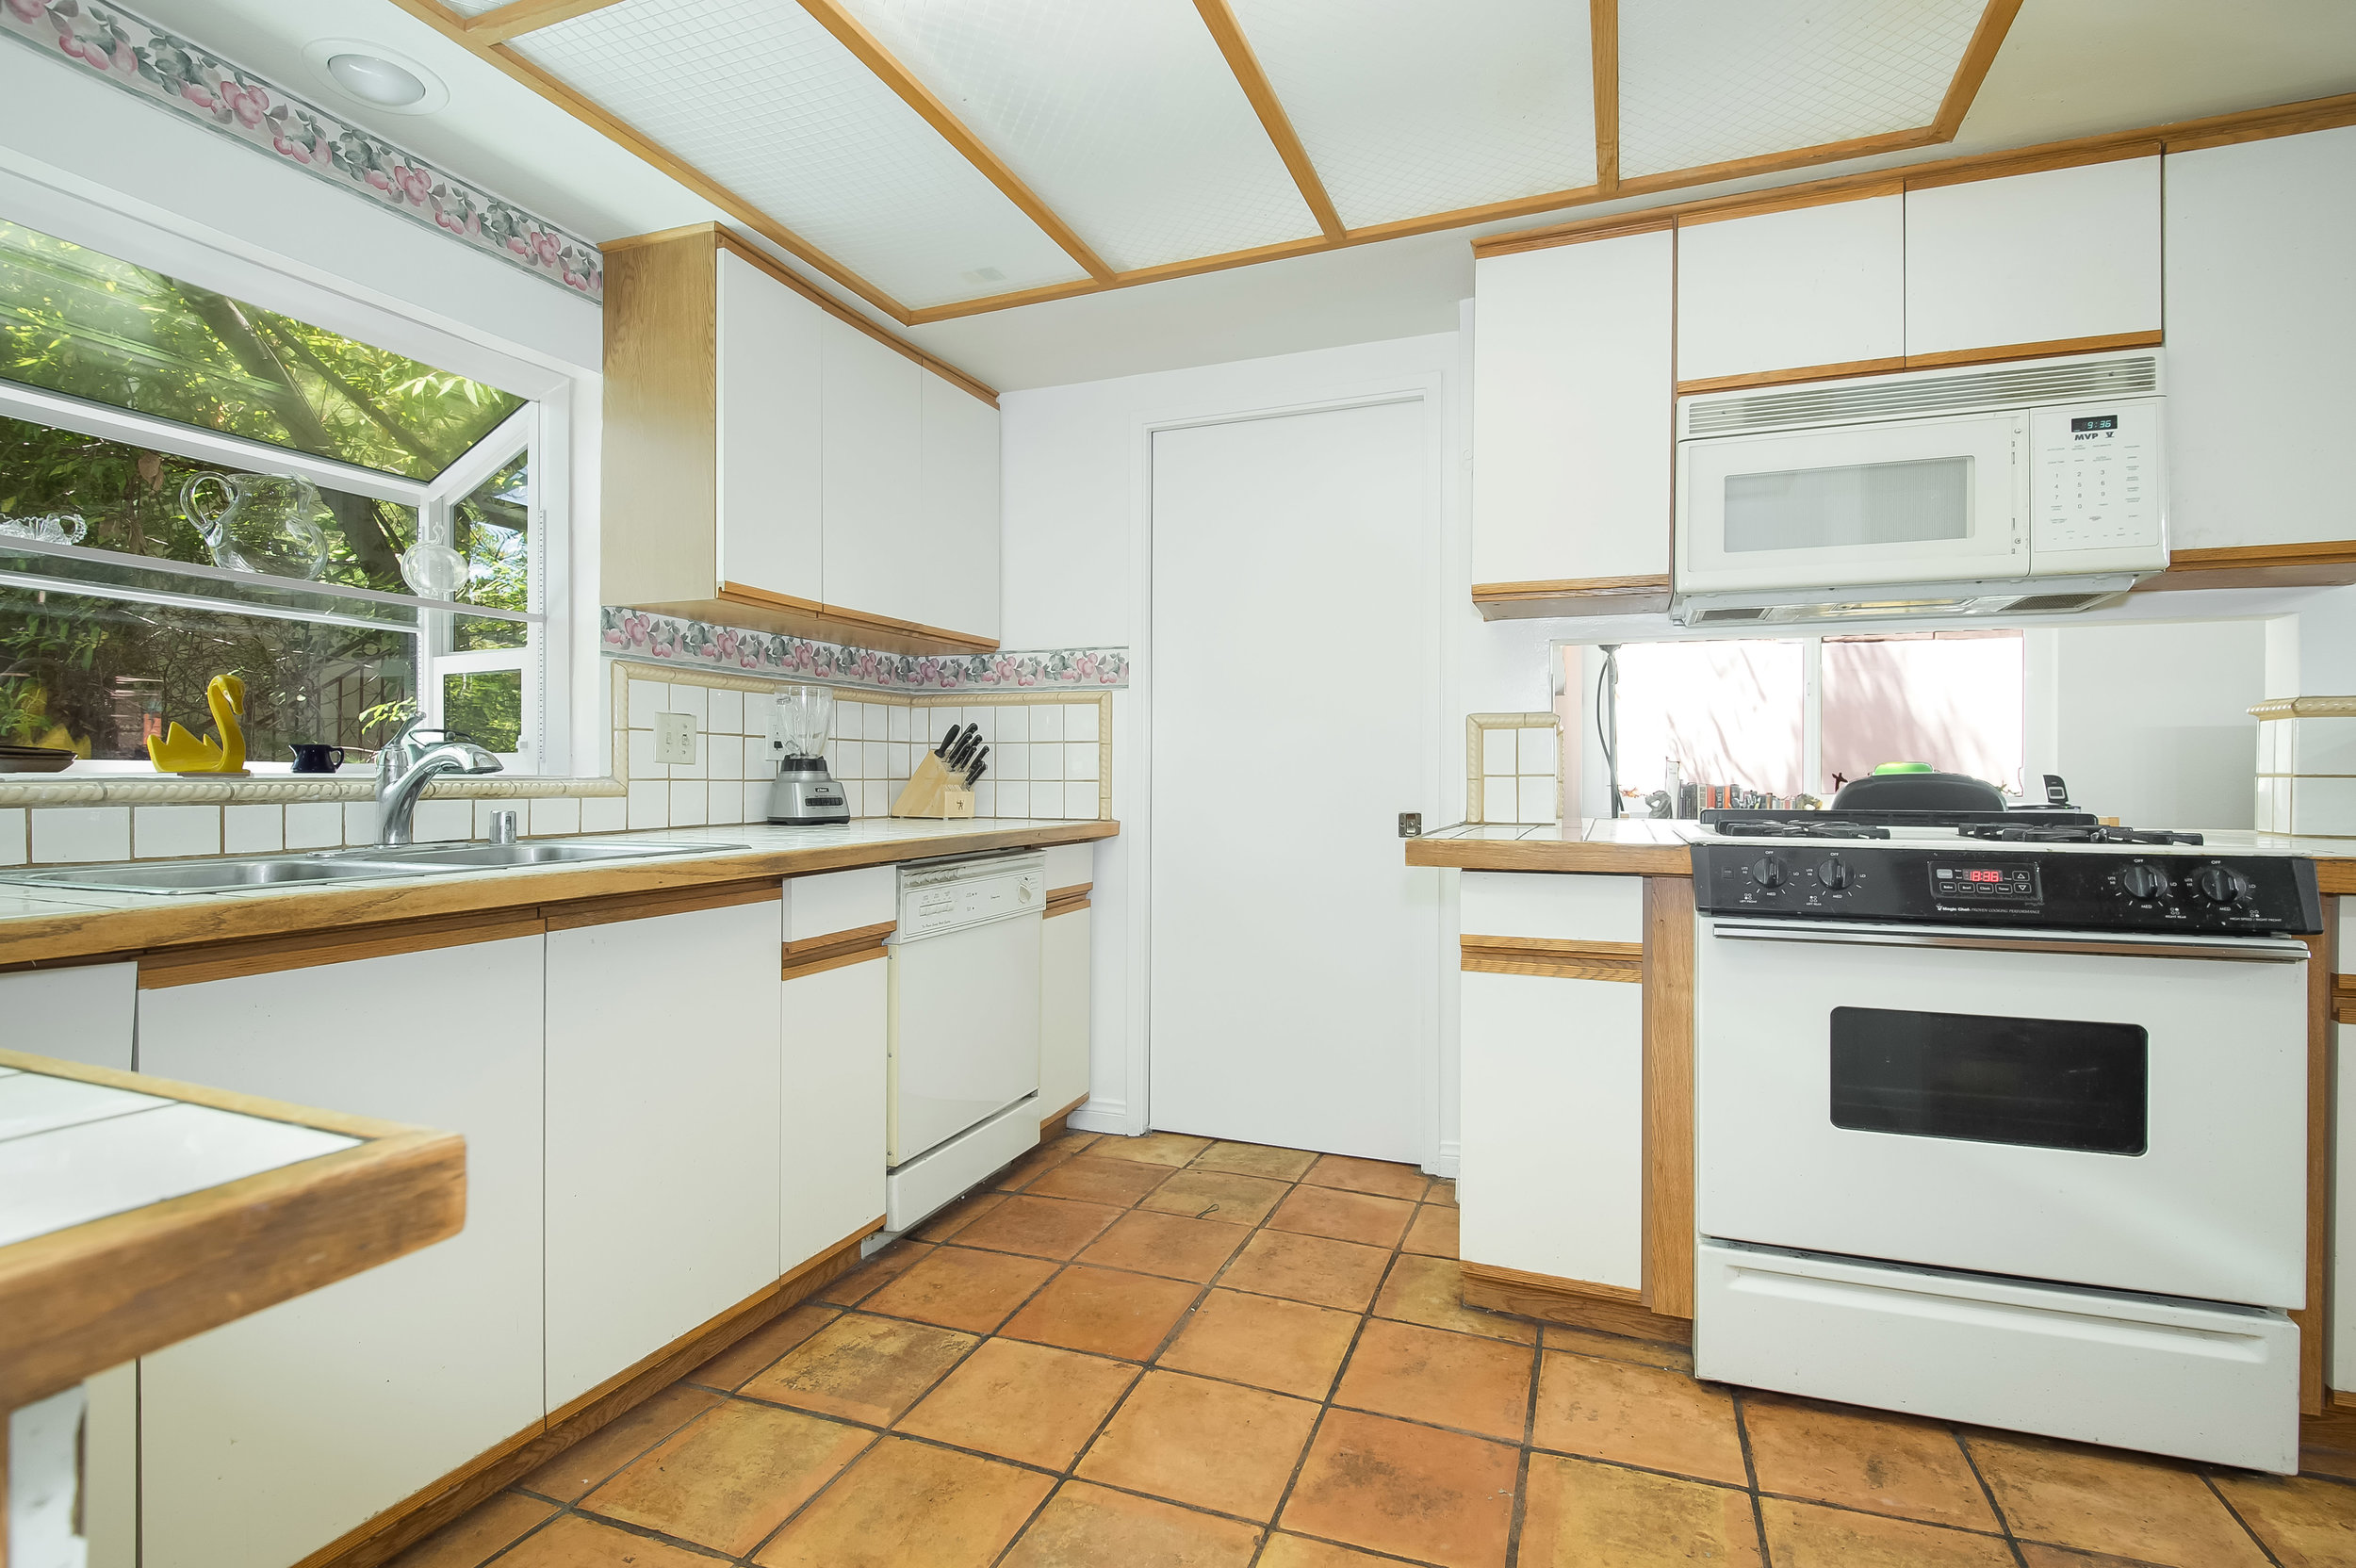 008 Kitchen 15072 Rayneta Sherman Oaks For Sale The Malibu Life Team Luxury Real Estate.jpg